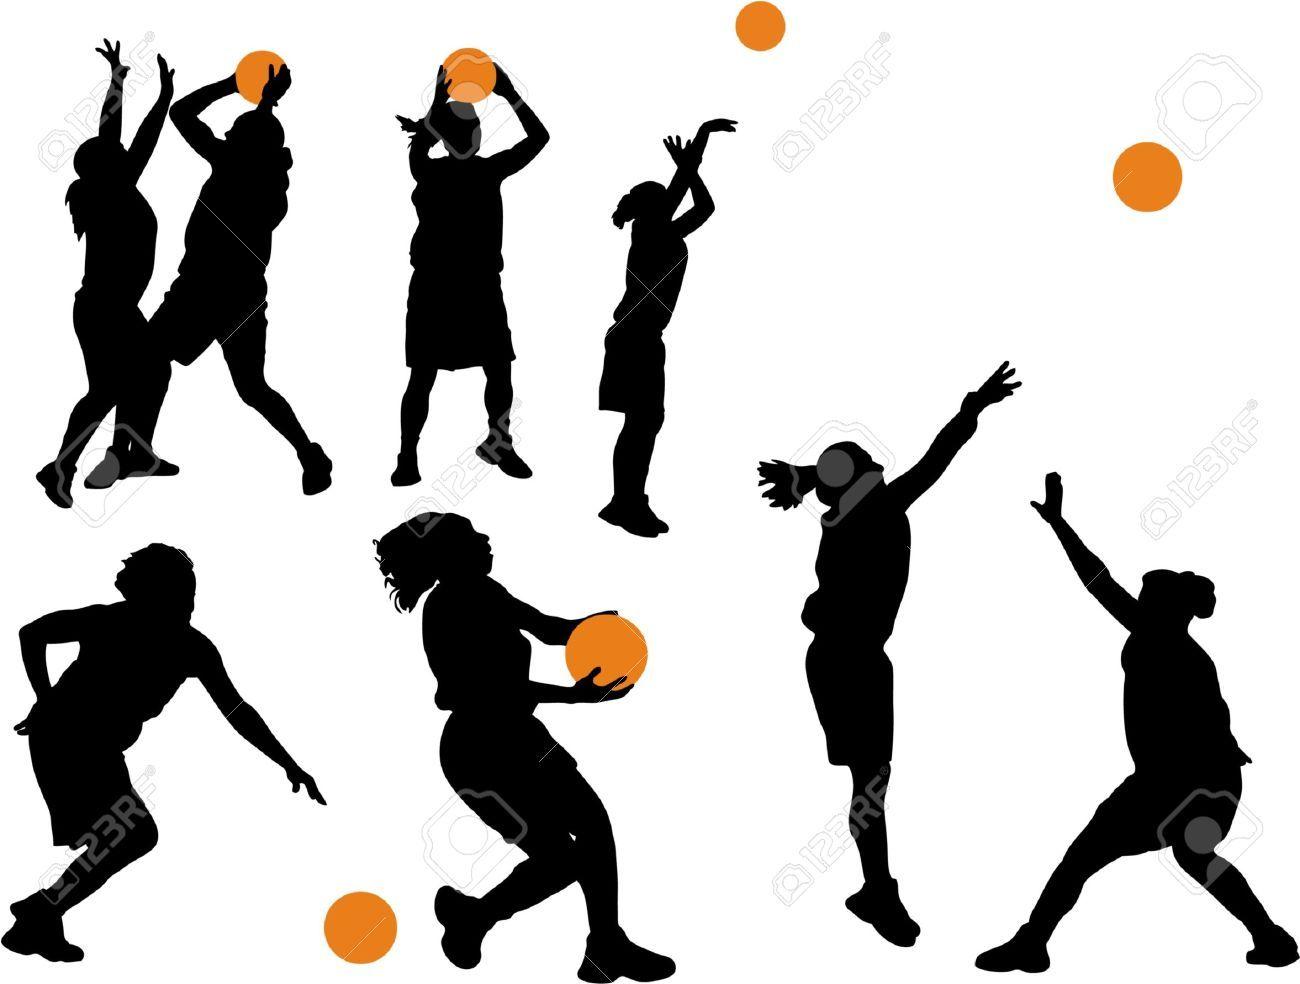 Basketball Girl Silhouette Clipart.